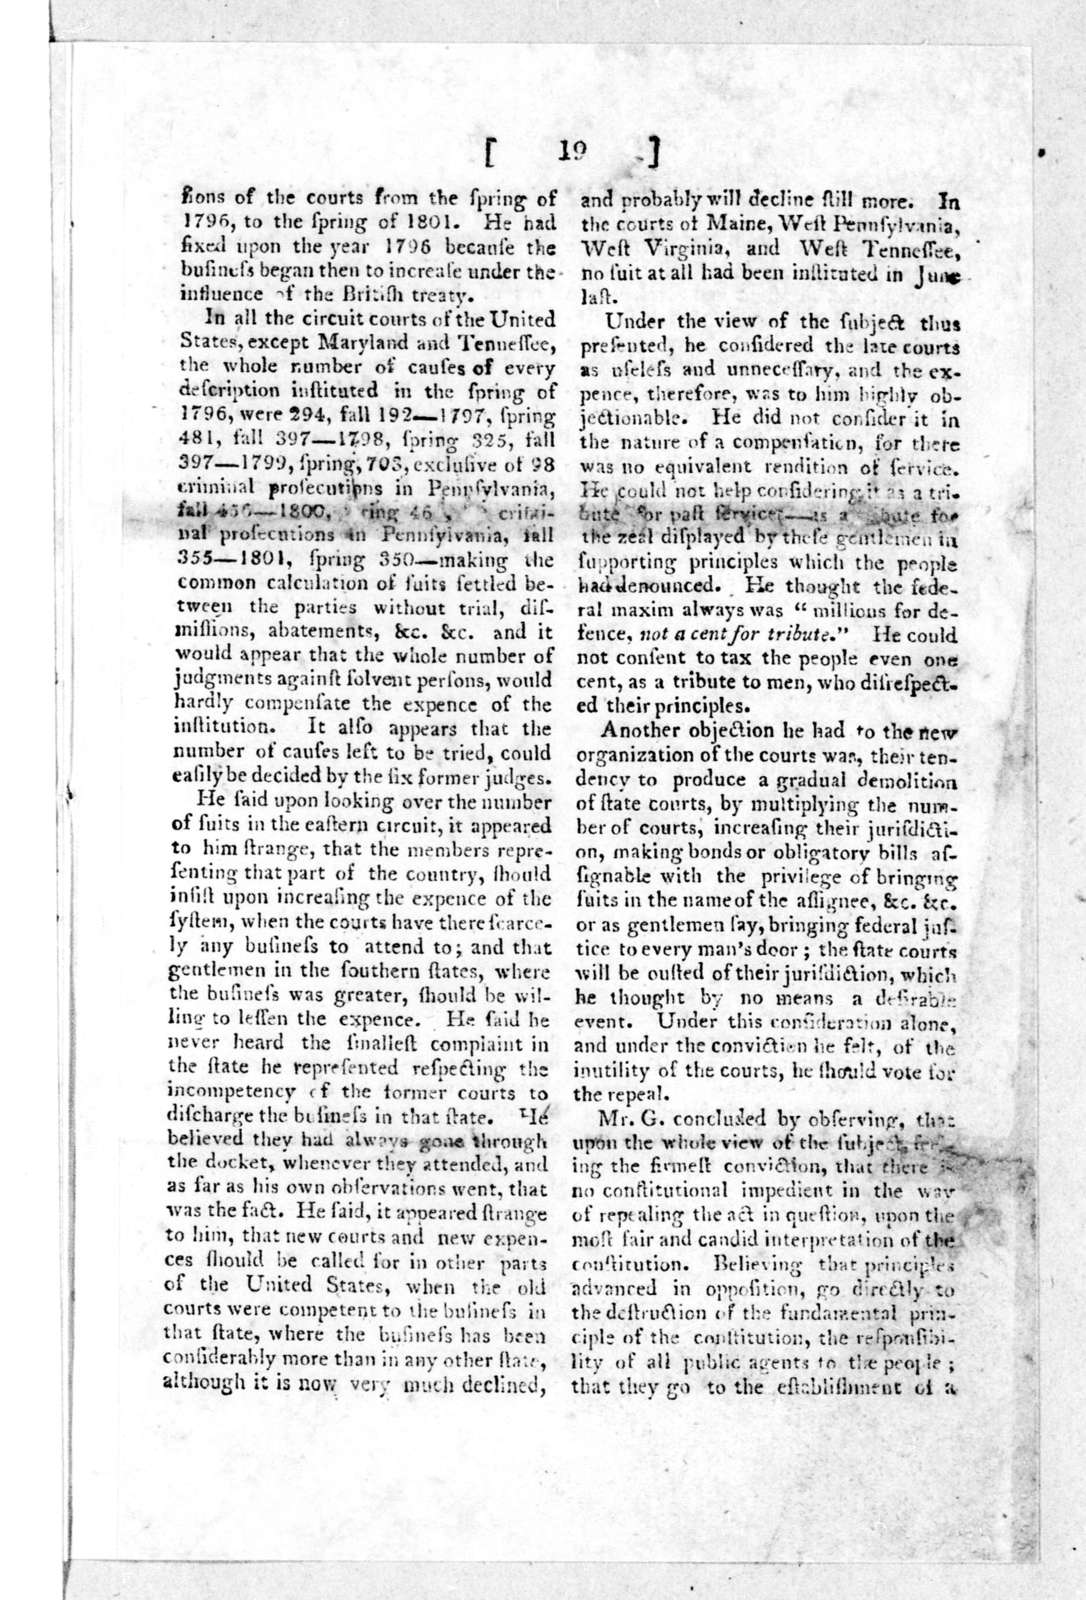 William Branch Giles, February 18, 1802